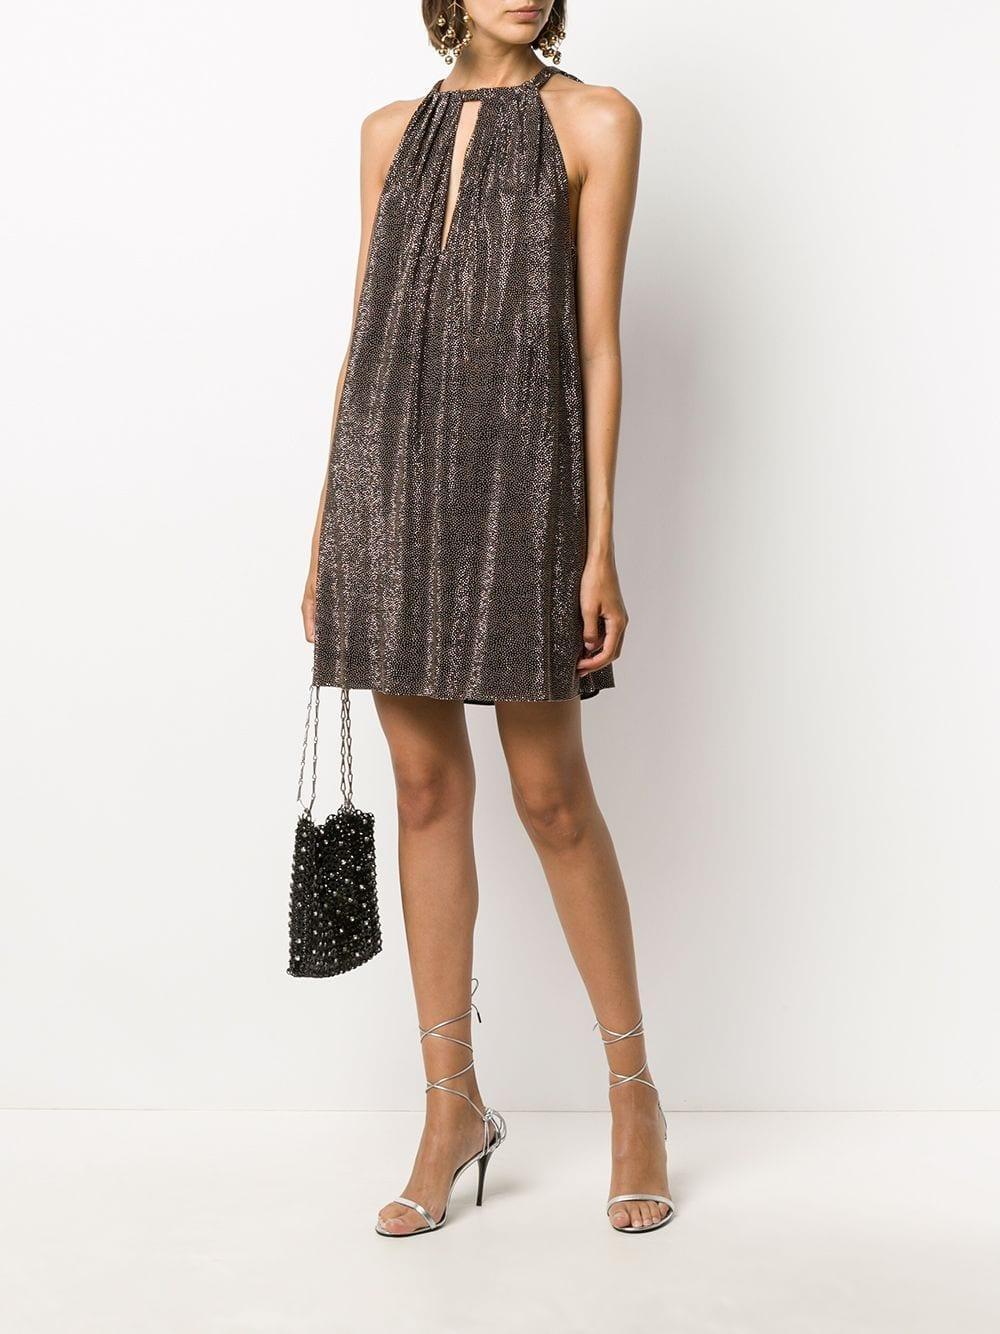 SAINT LAURENT Studded Halterneck Mini Dress